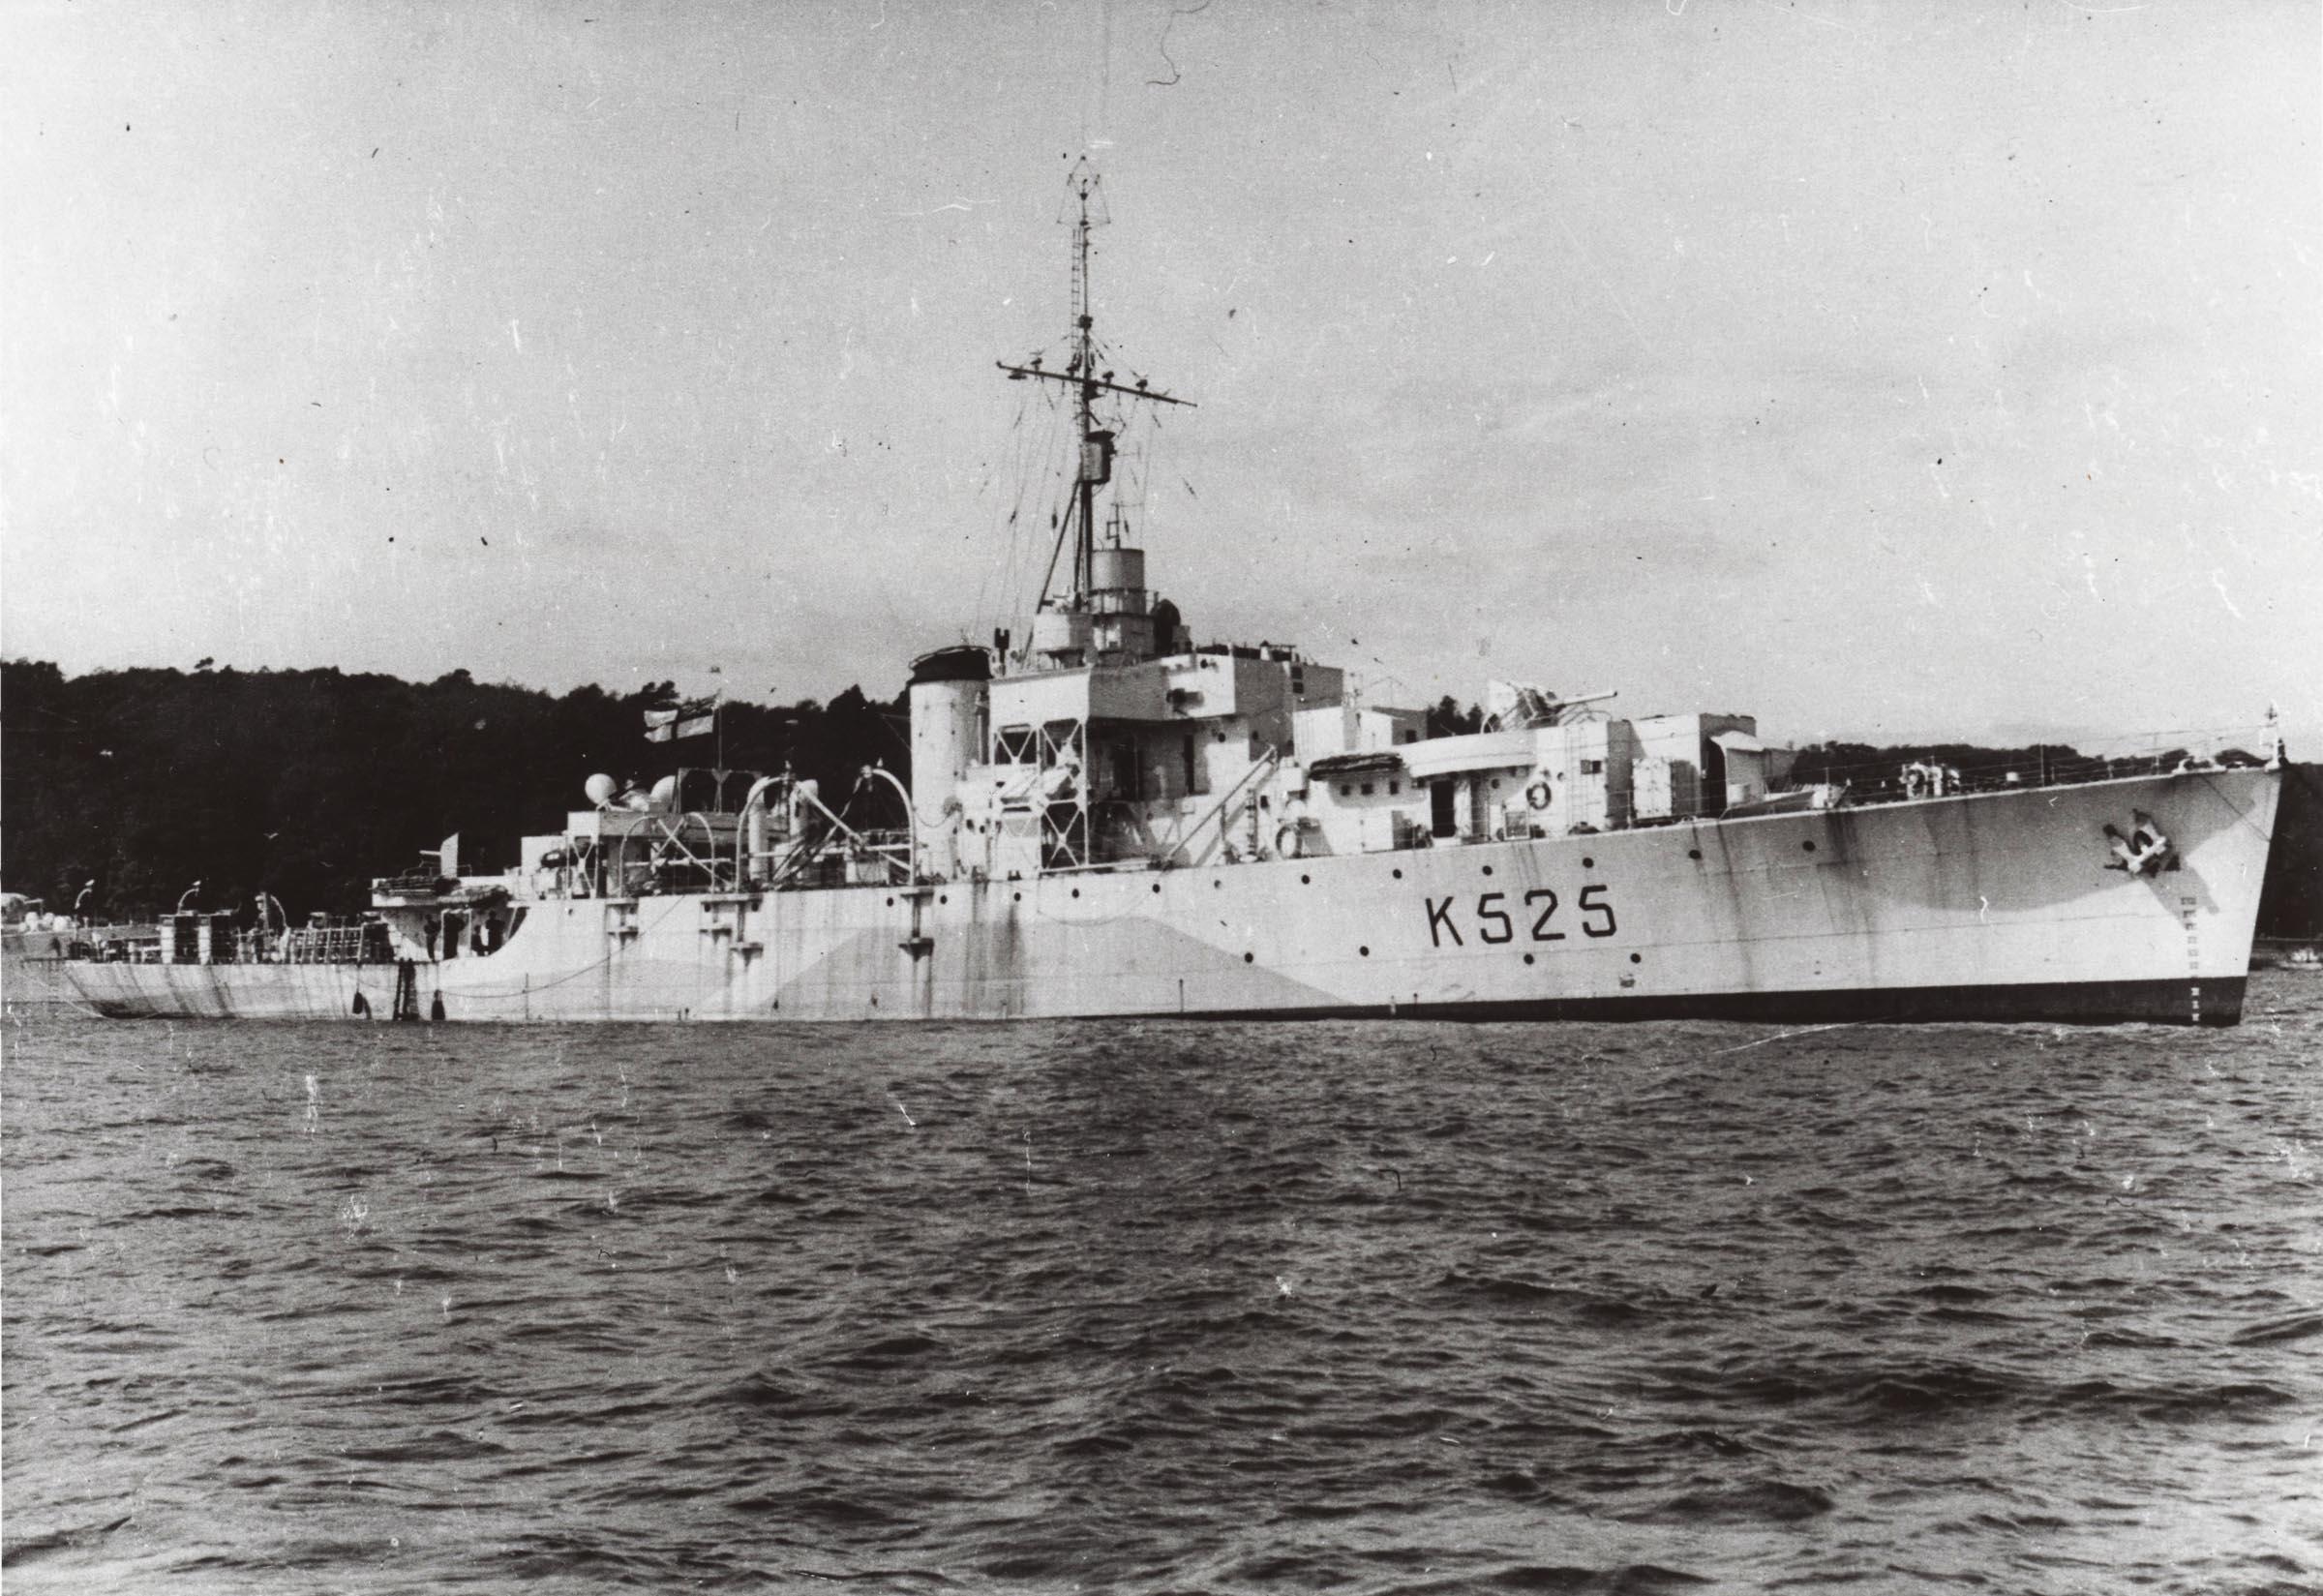 HMCS RIBBLE